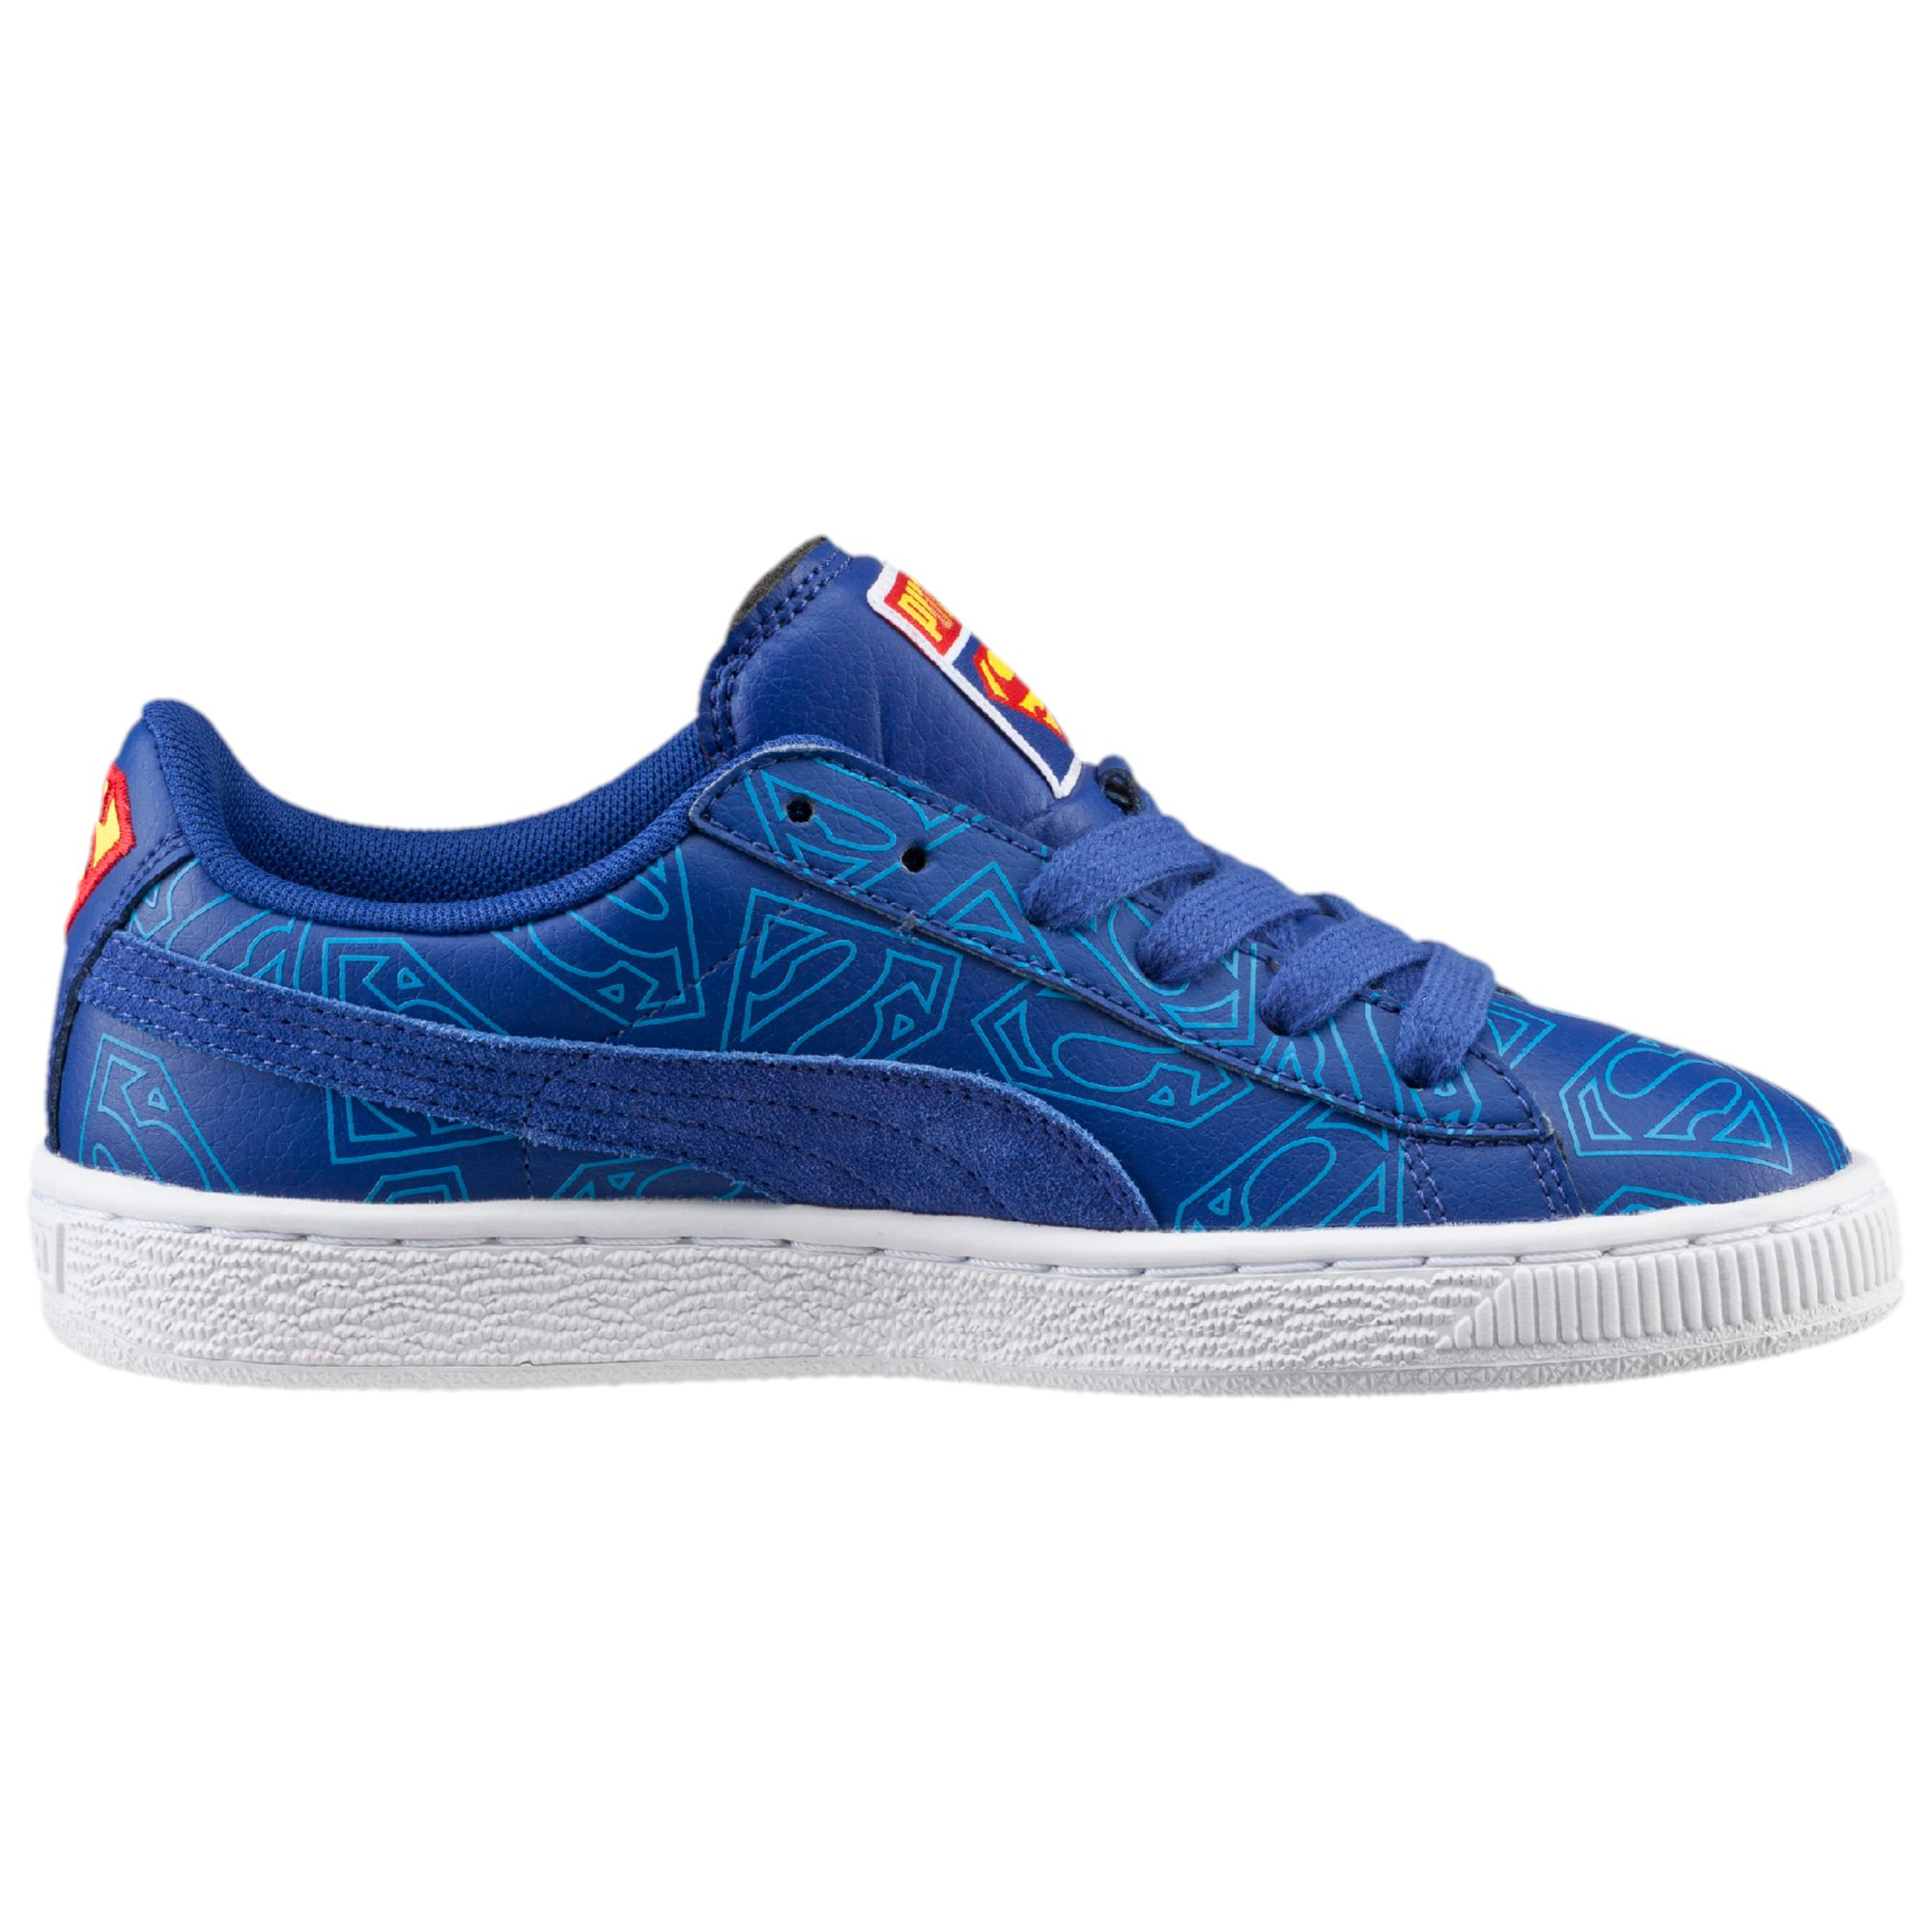 Dettagli su PUMA Sneaker Basket Superman Jr. Calzature Scarpe Bambini Unisex Nuovo